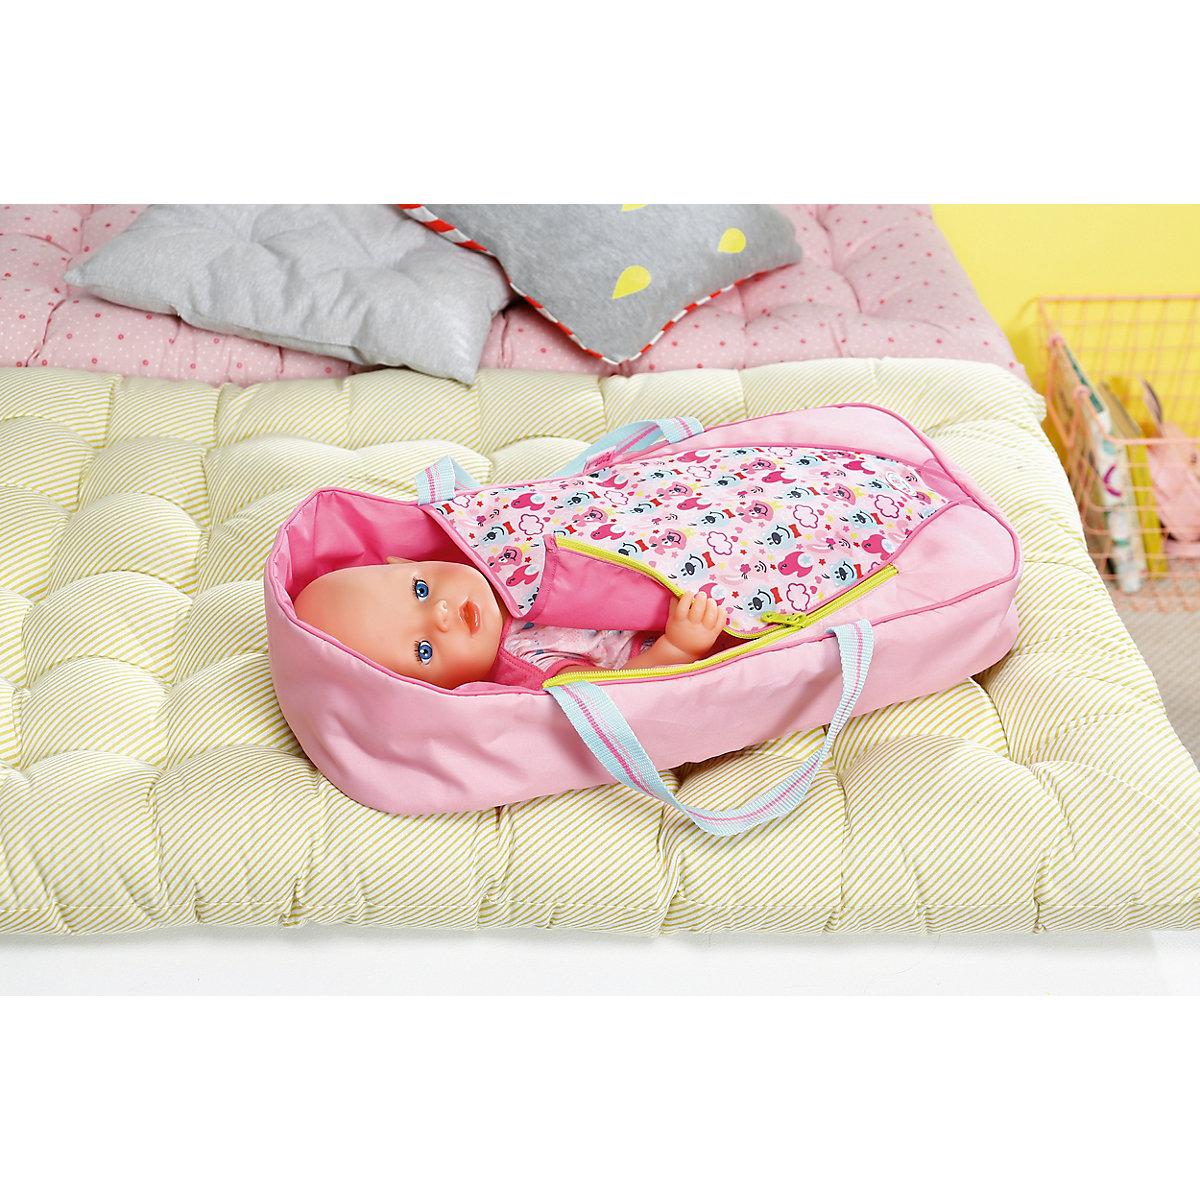 baby born schlaf und tragetasche baby born mytoys. Black Bedroom Furniture Sets. Home Design Ideas